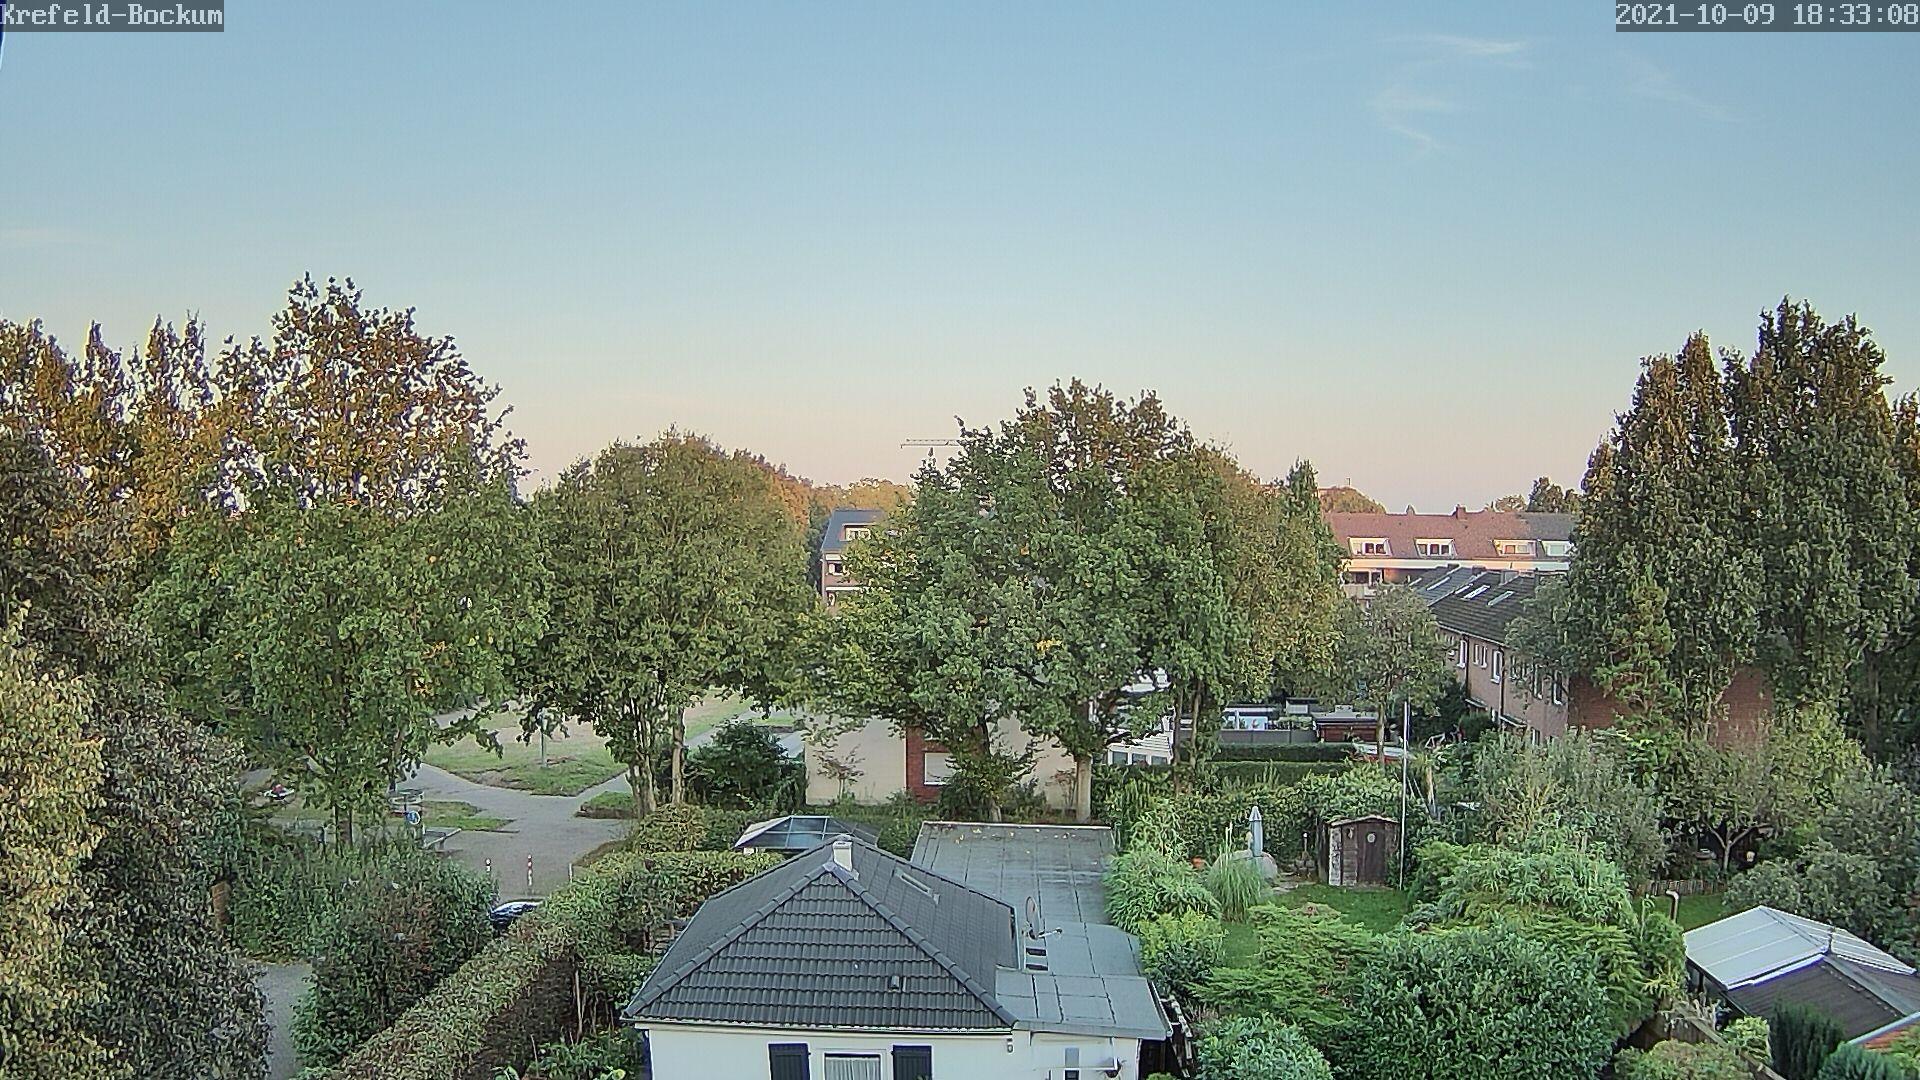 Krefeld - Bockum aktuelles Bild